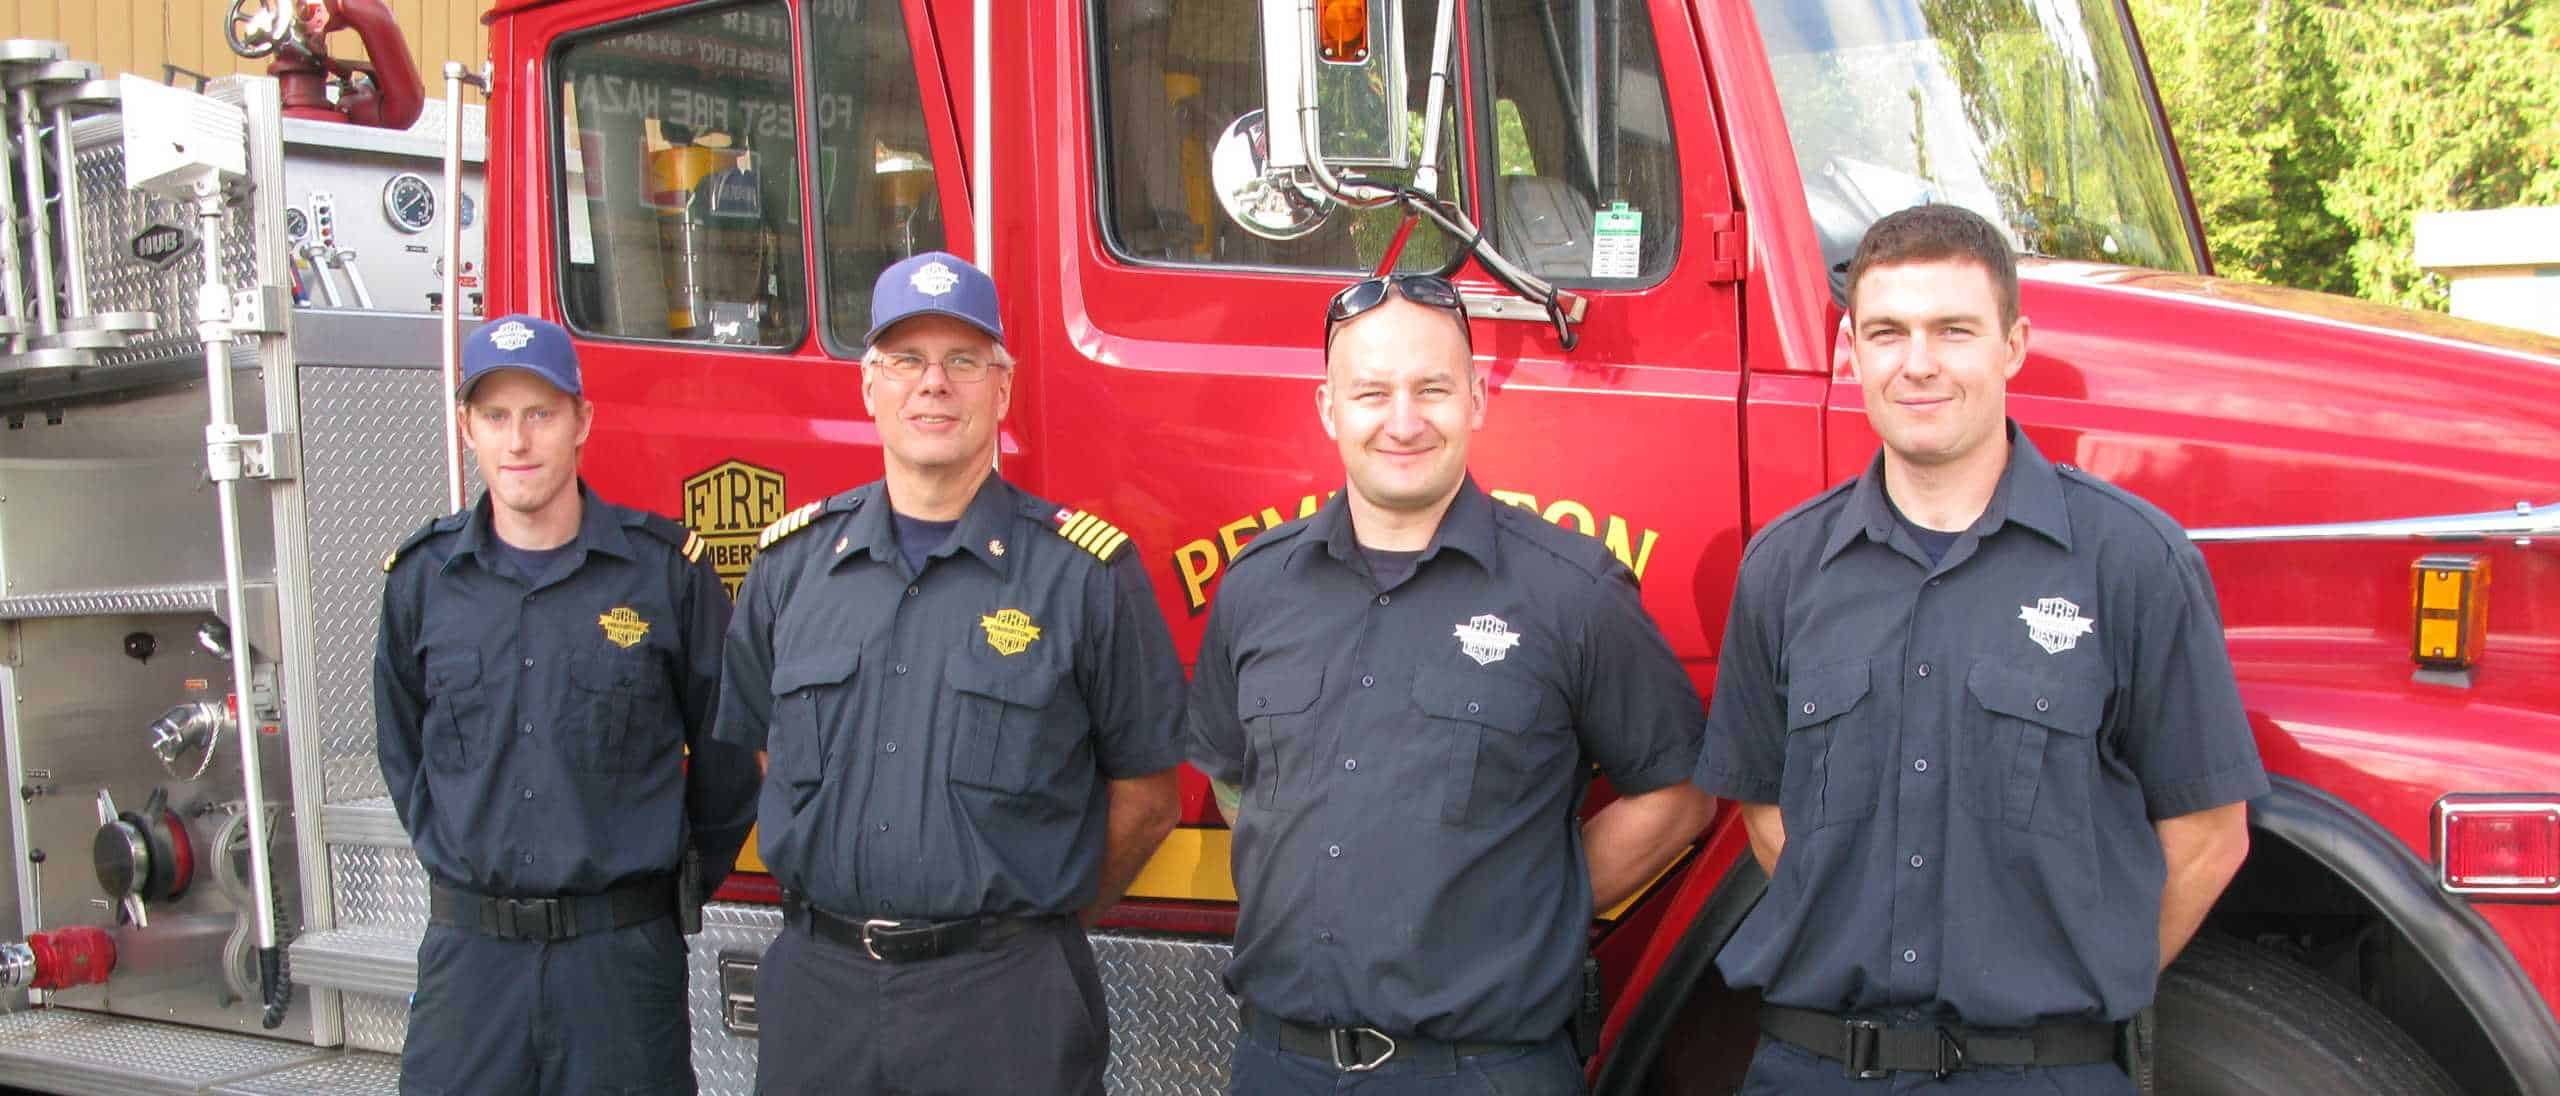 Pemberton Fire Department